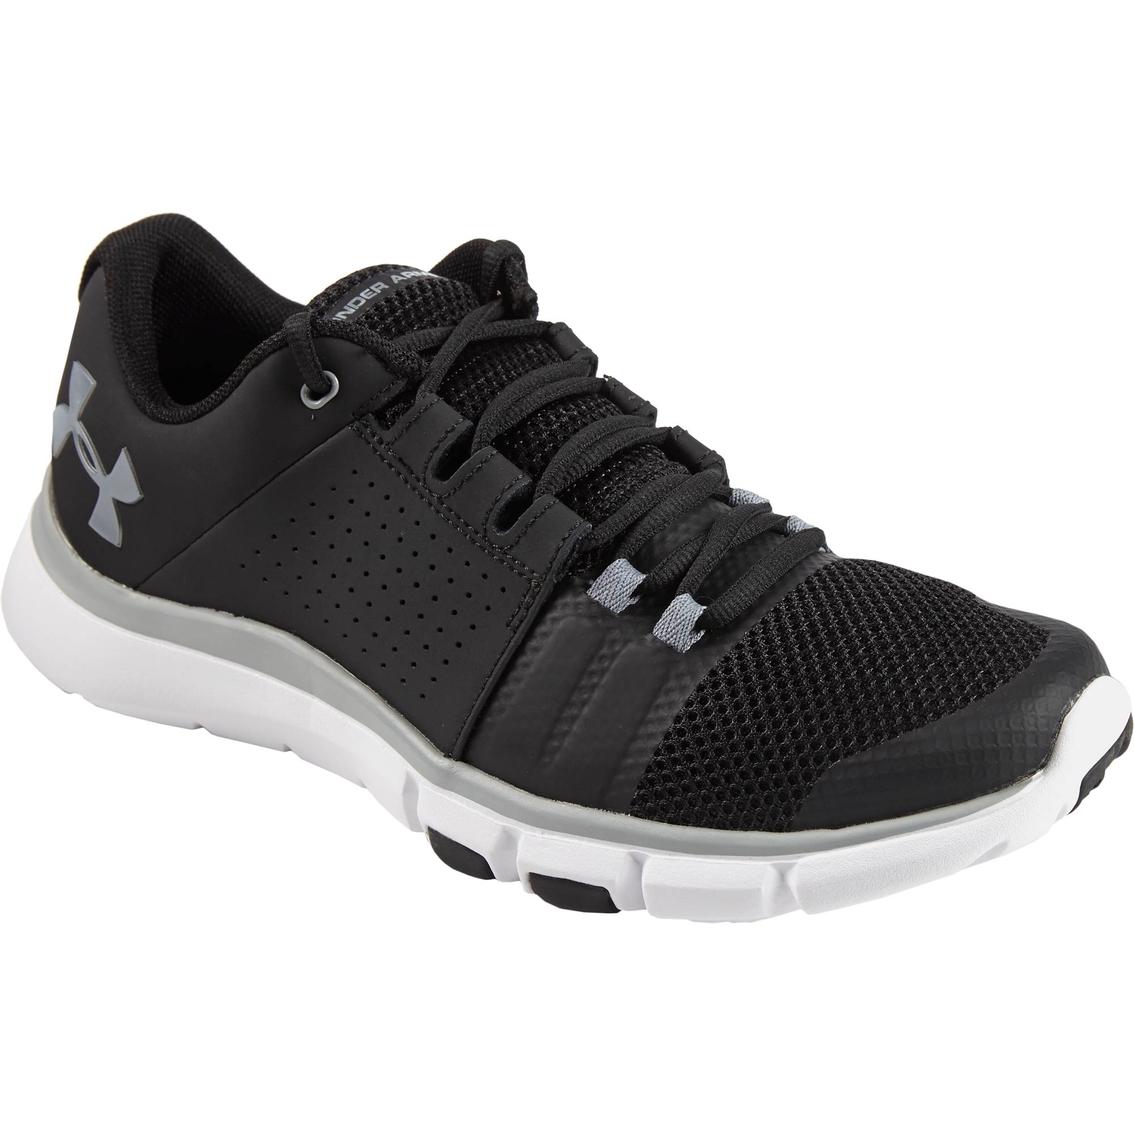 Strive 7 Cross Training Shoes